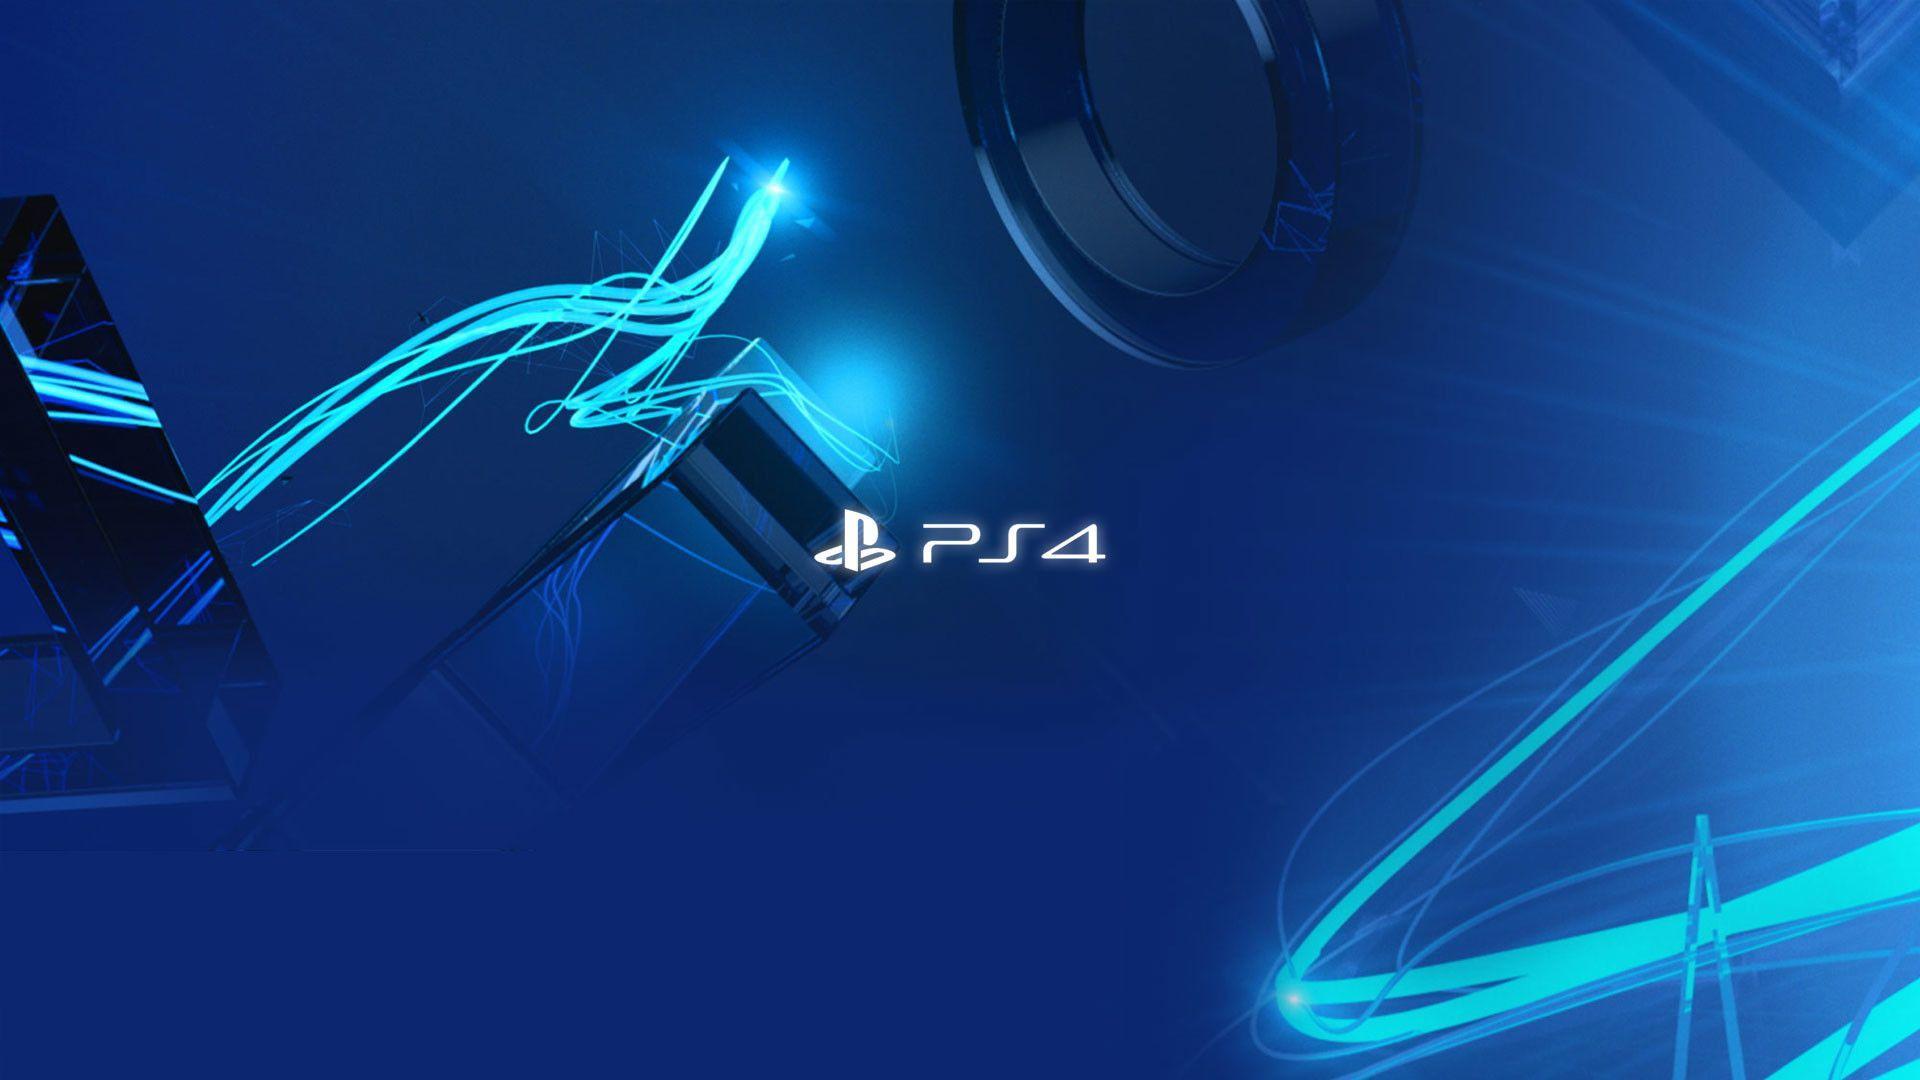 PS4 Desktop Wallpapers - Top Free PS4 Desktop Backgrounds - WallpaperAccess